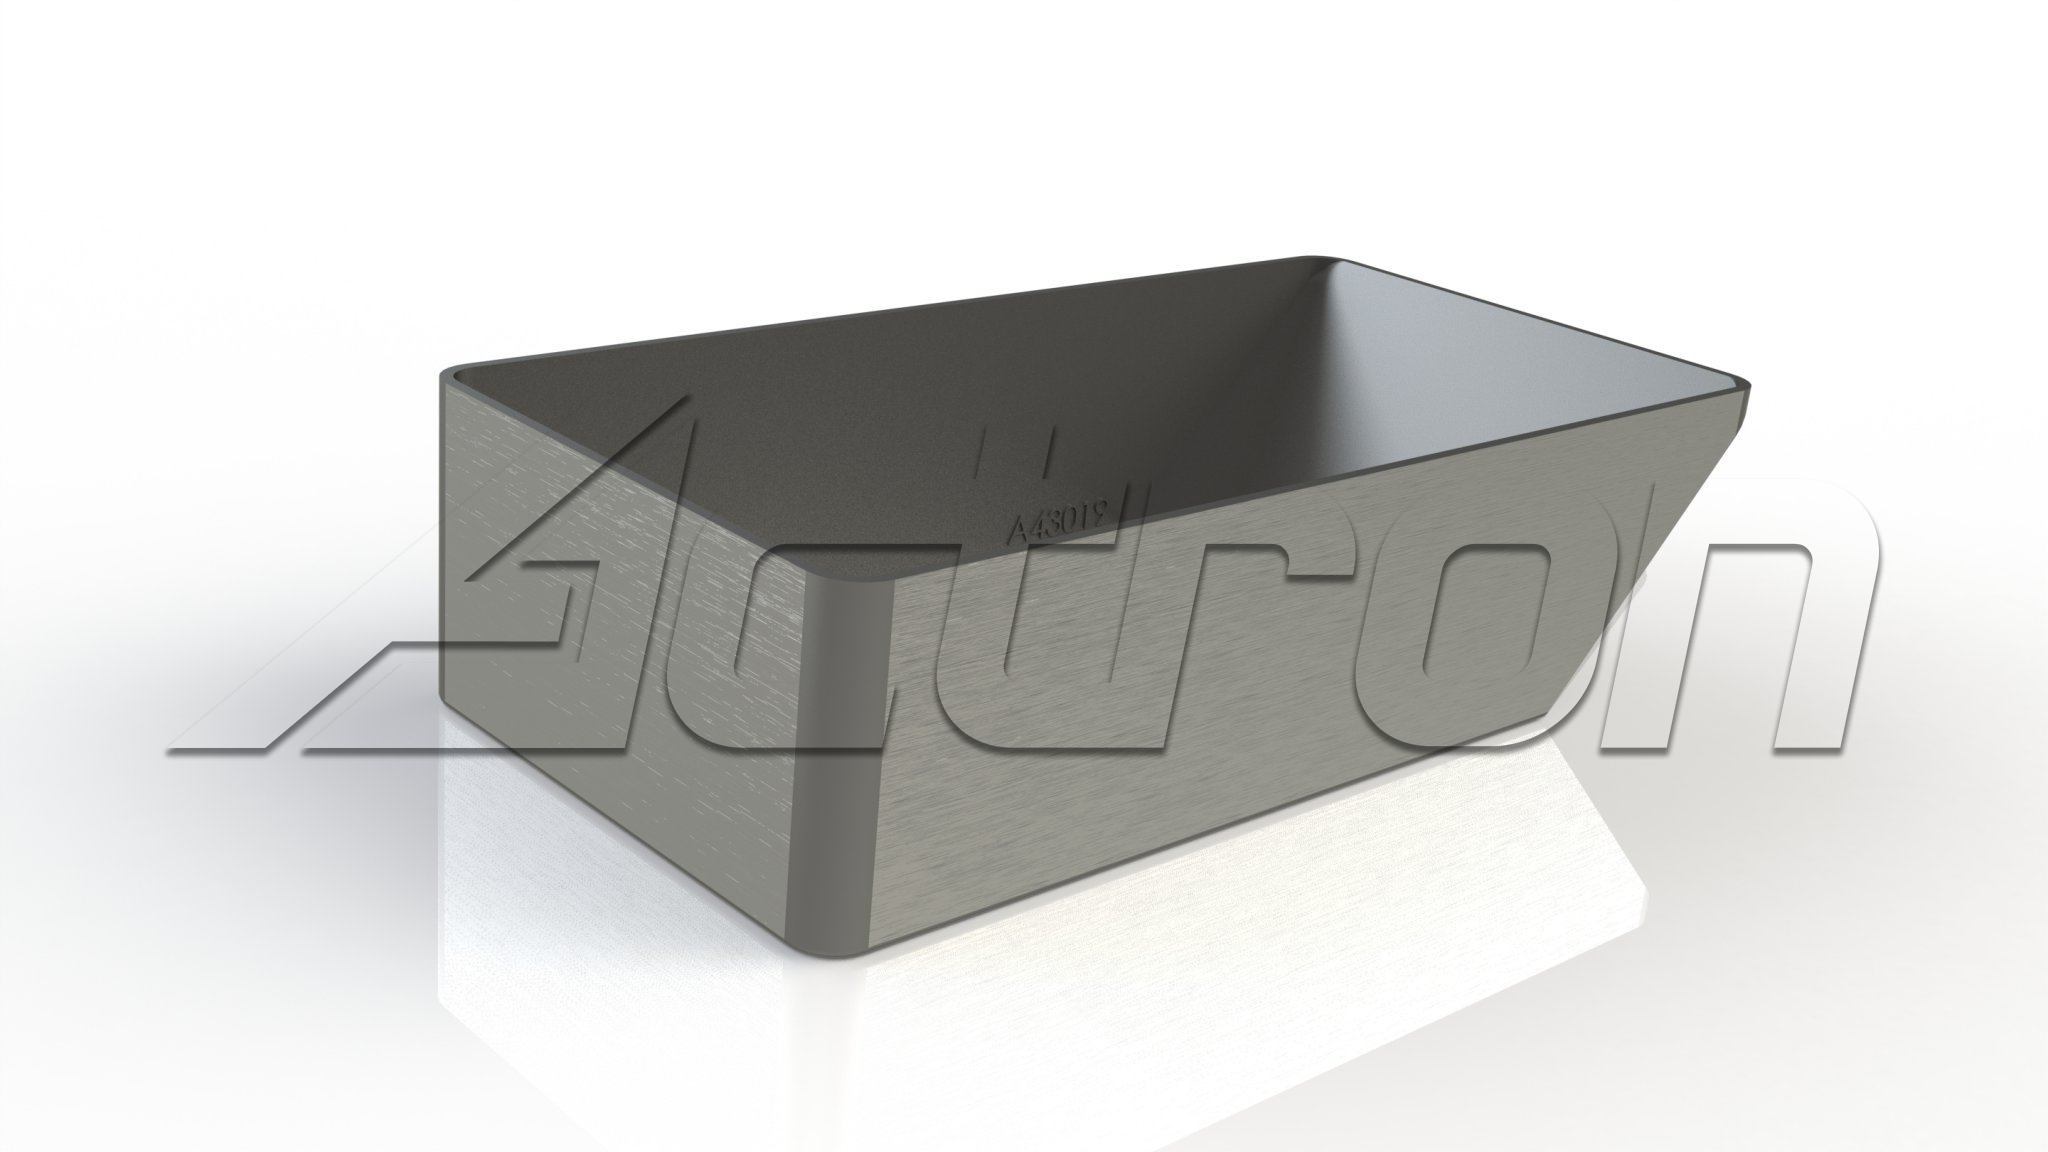 mounting-bracket-8211-latch-5272-a43019.jpg